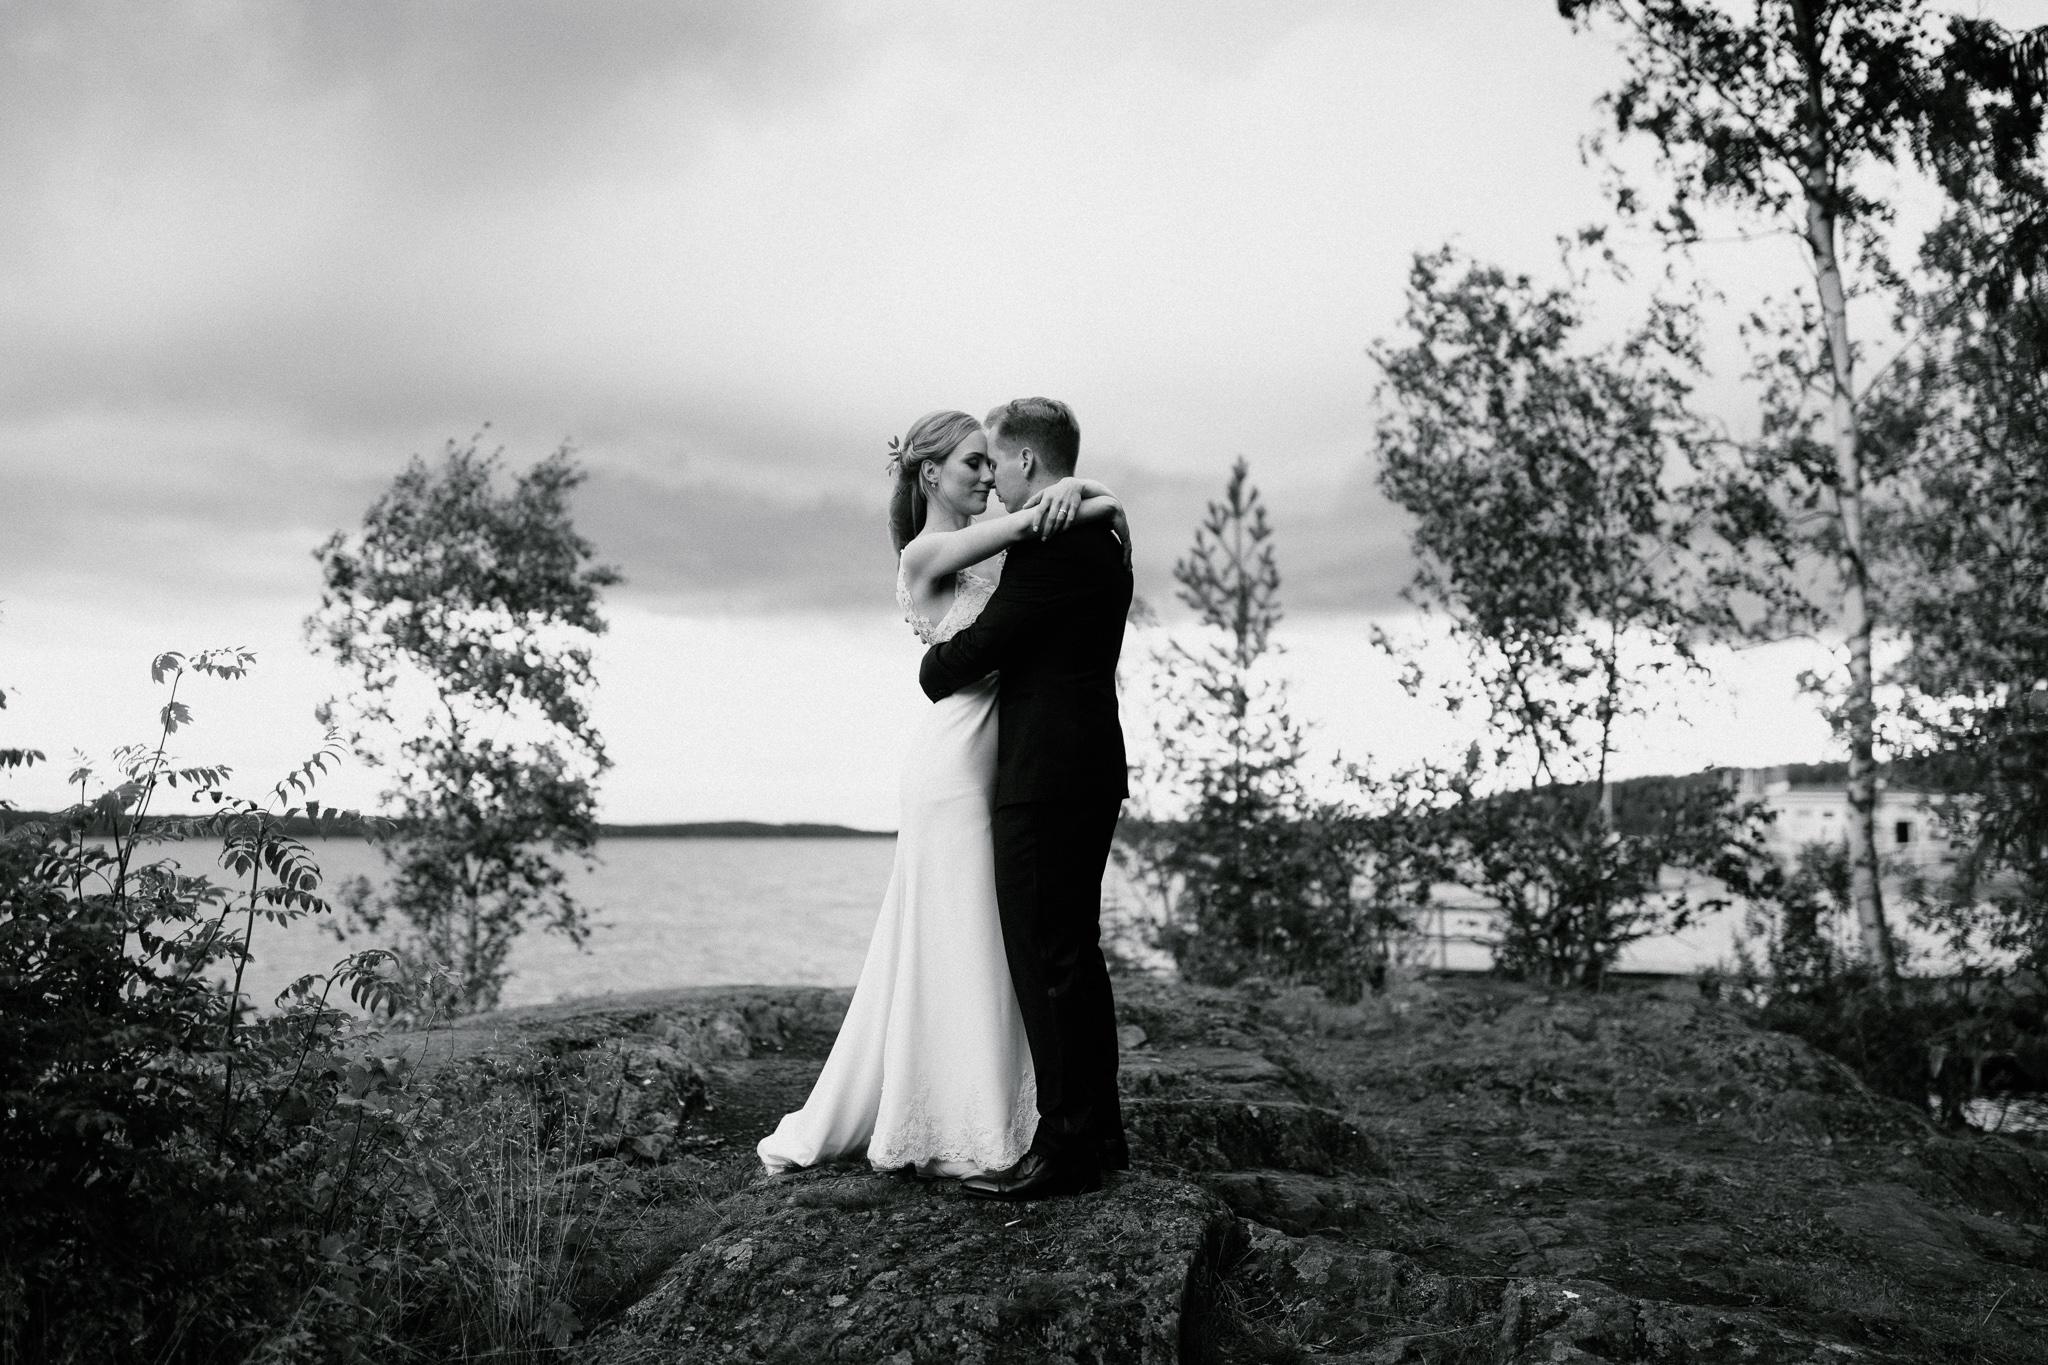 Johanna + Mikko - Tampere - Photo by Patrick Karkkolainen Wedding Photographer-142.jpg